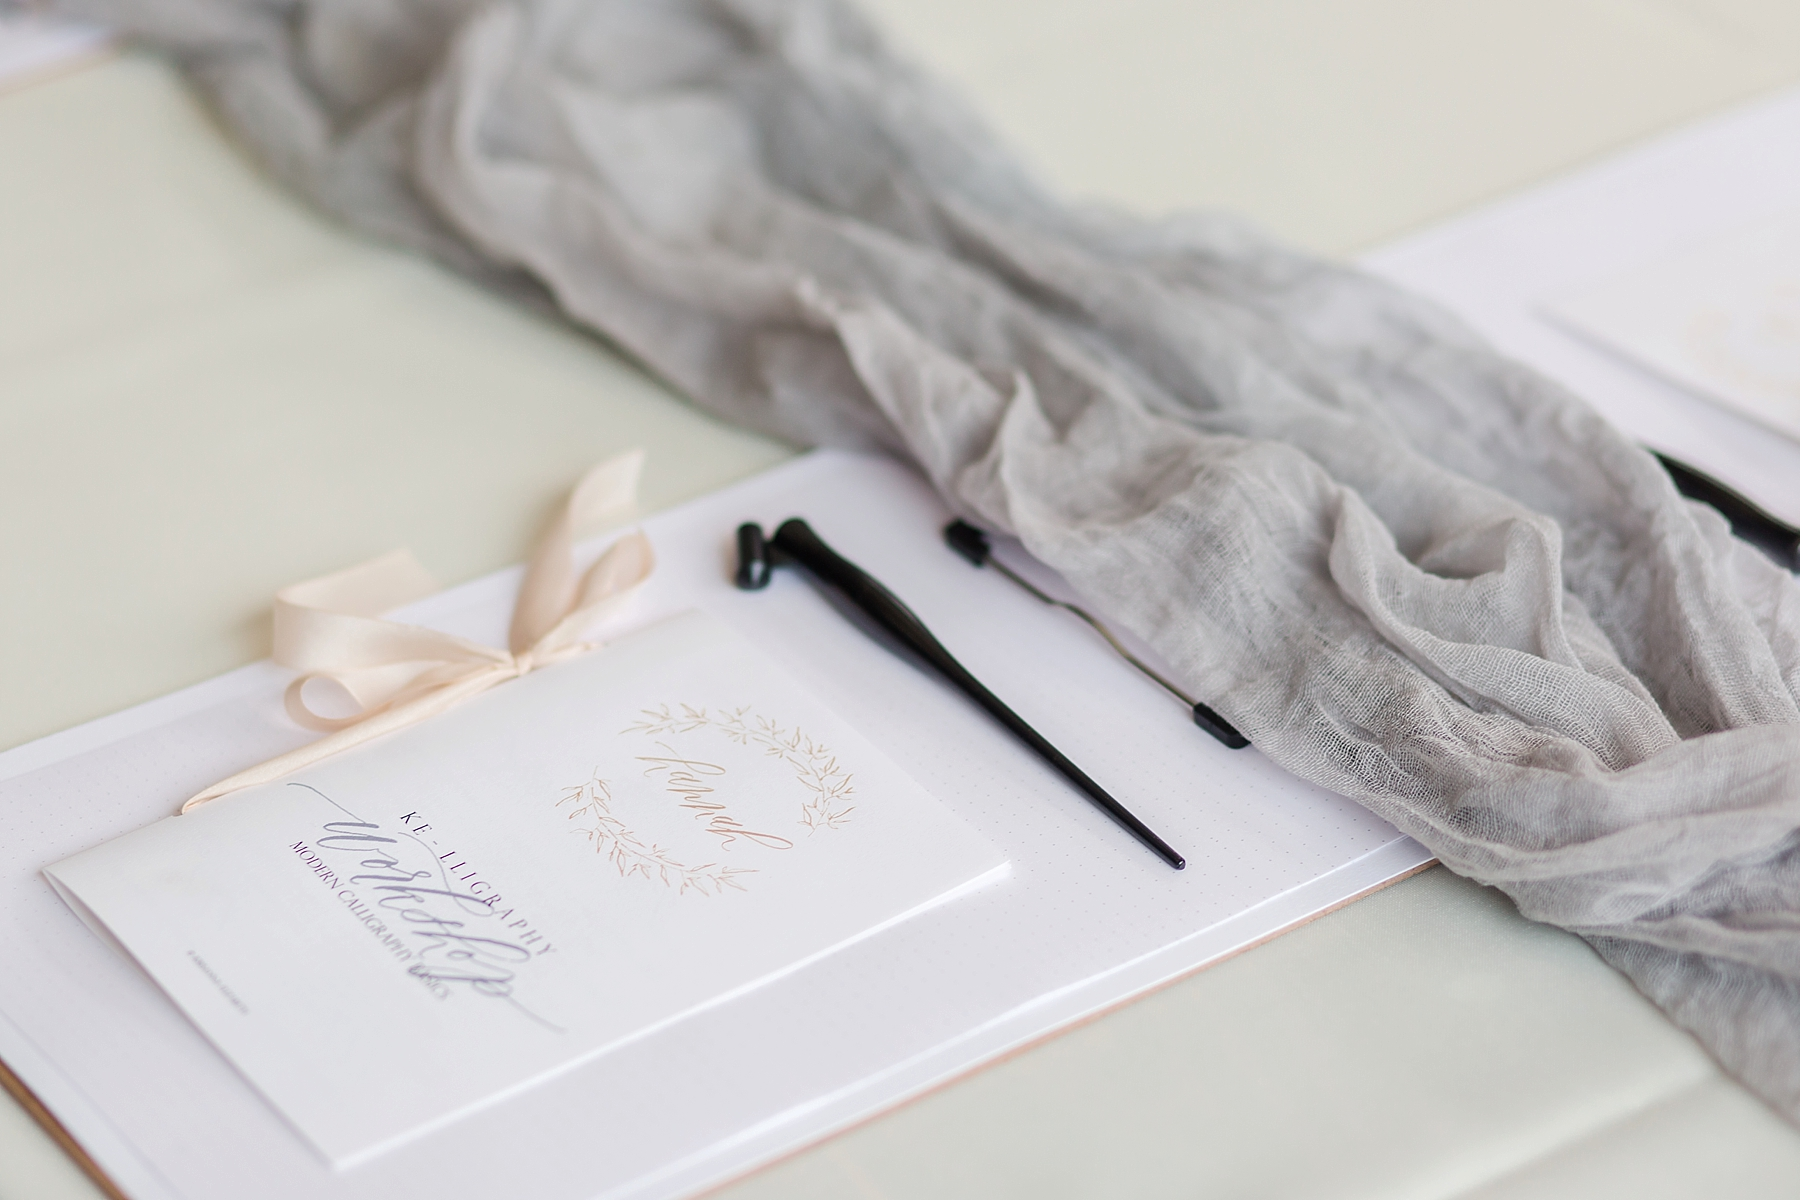 seattle-calligraphy-workshop_0016.jpg